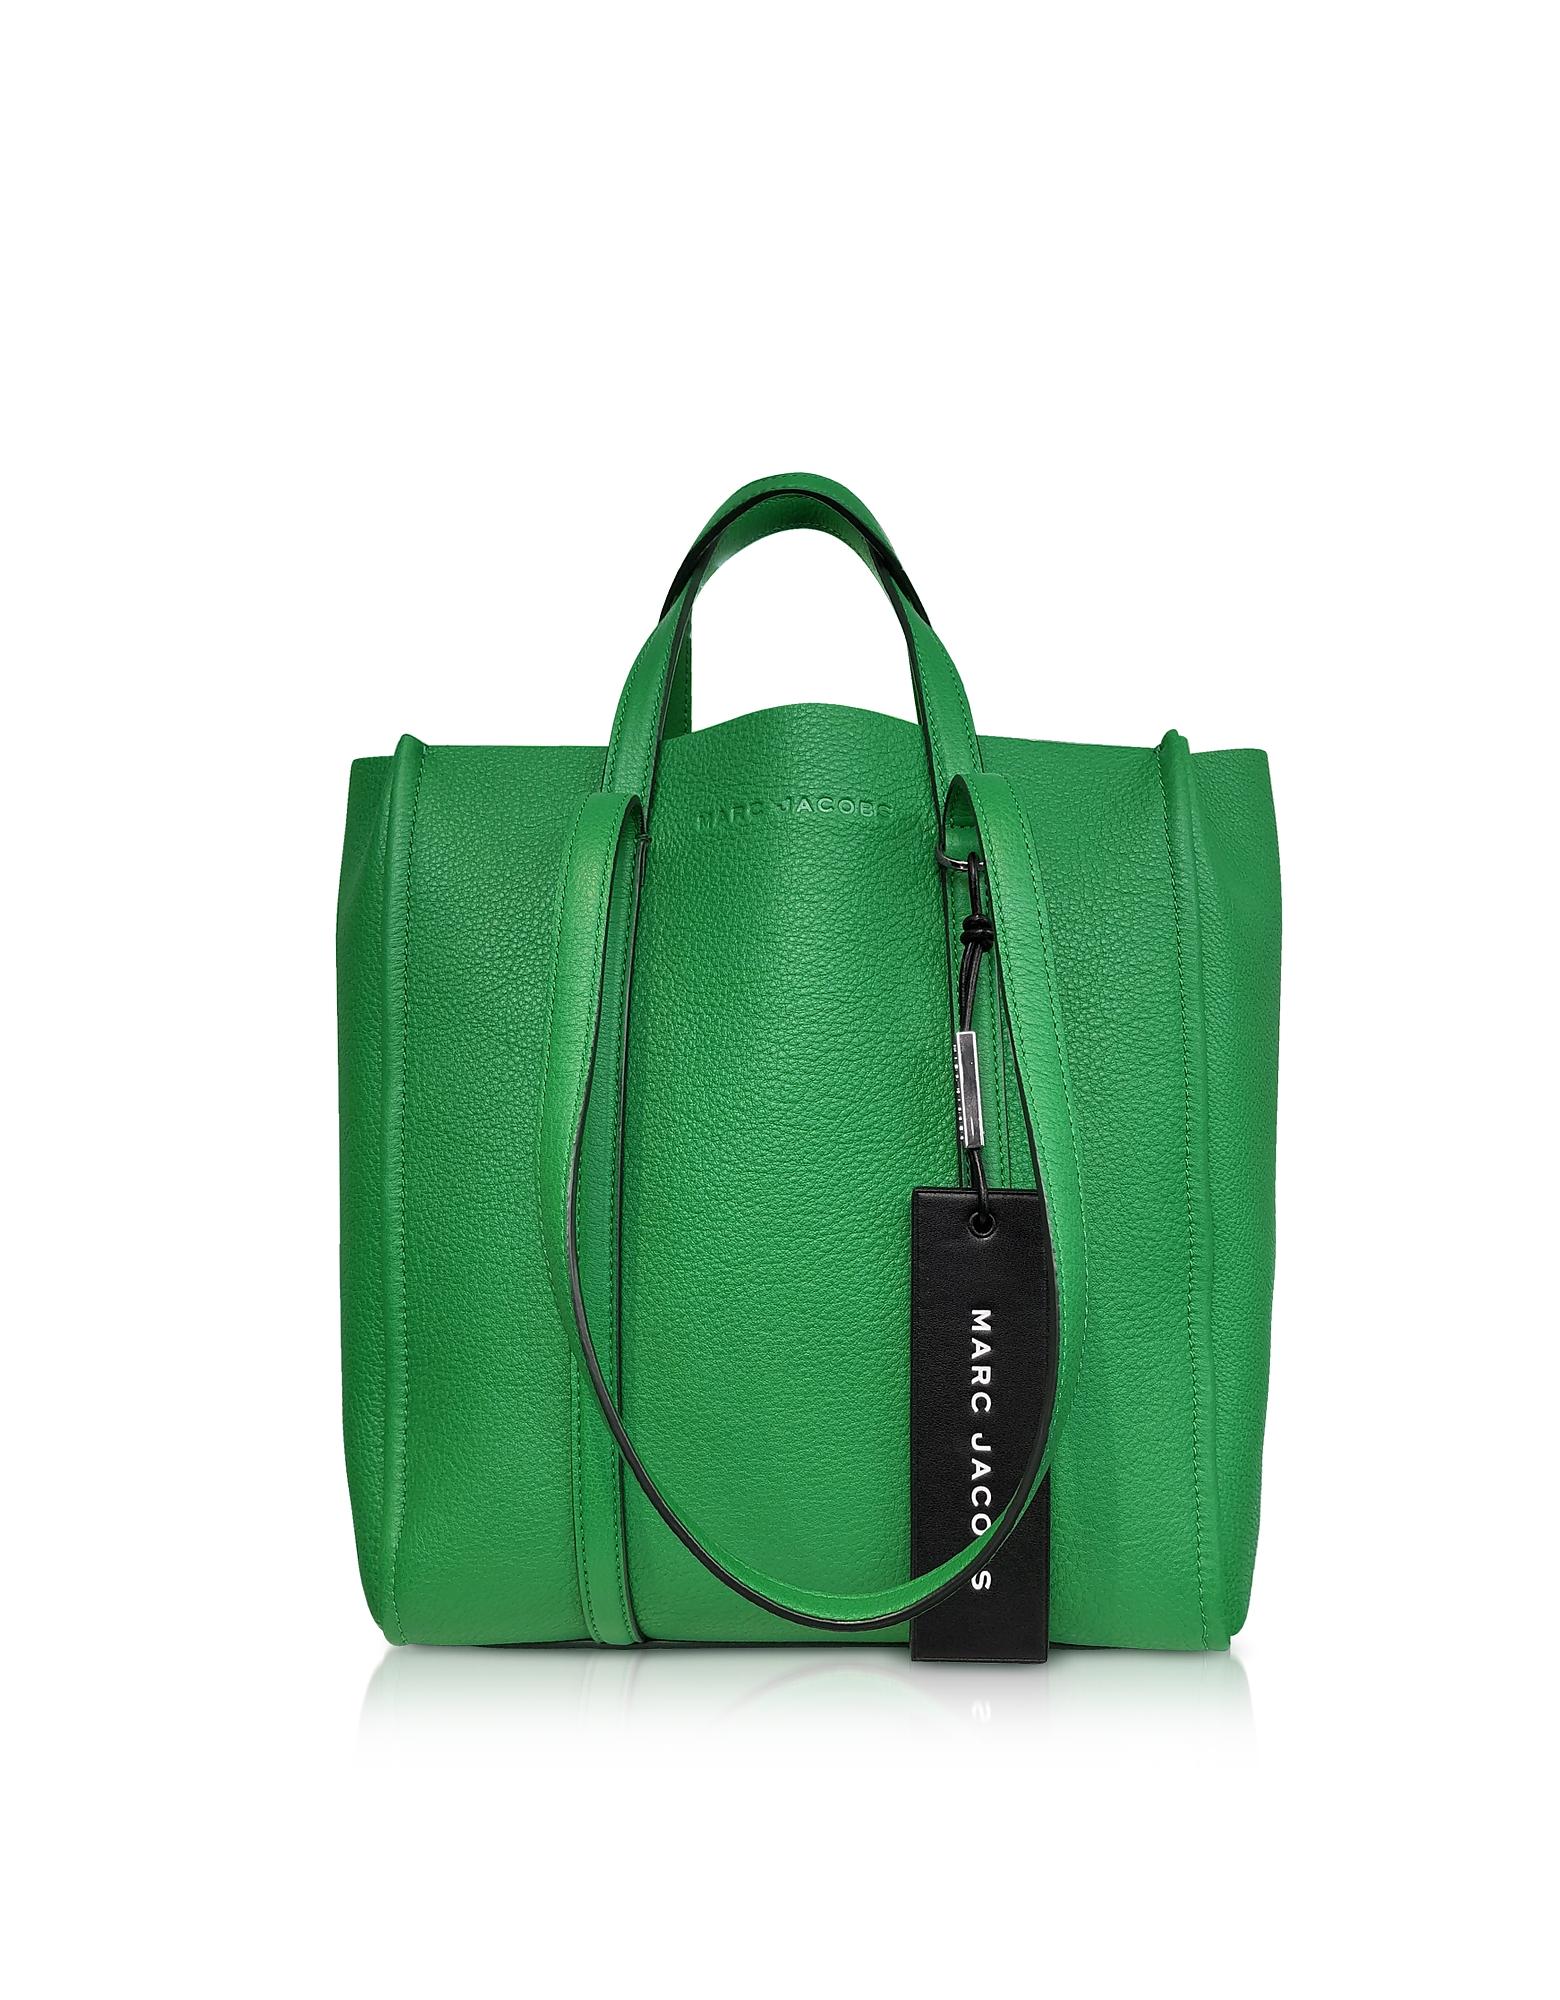 Marc Jacobs Handbags, The Tag Tote